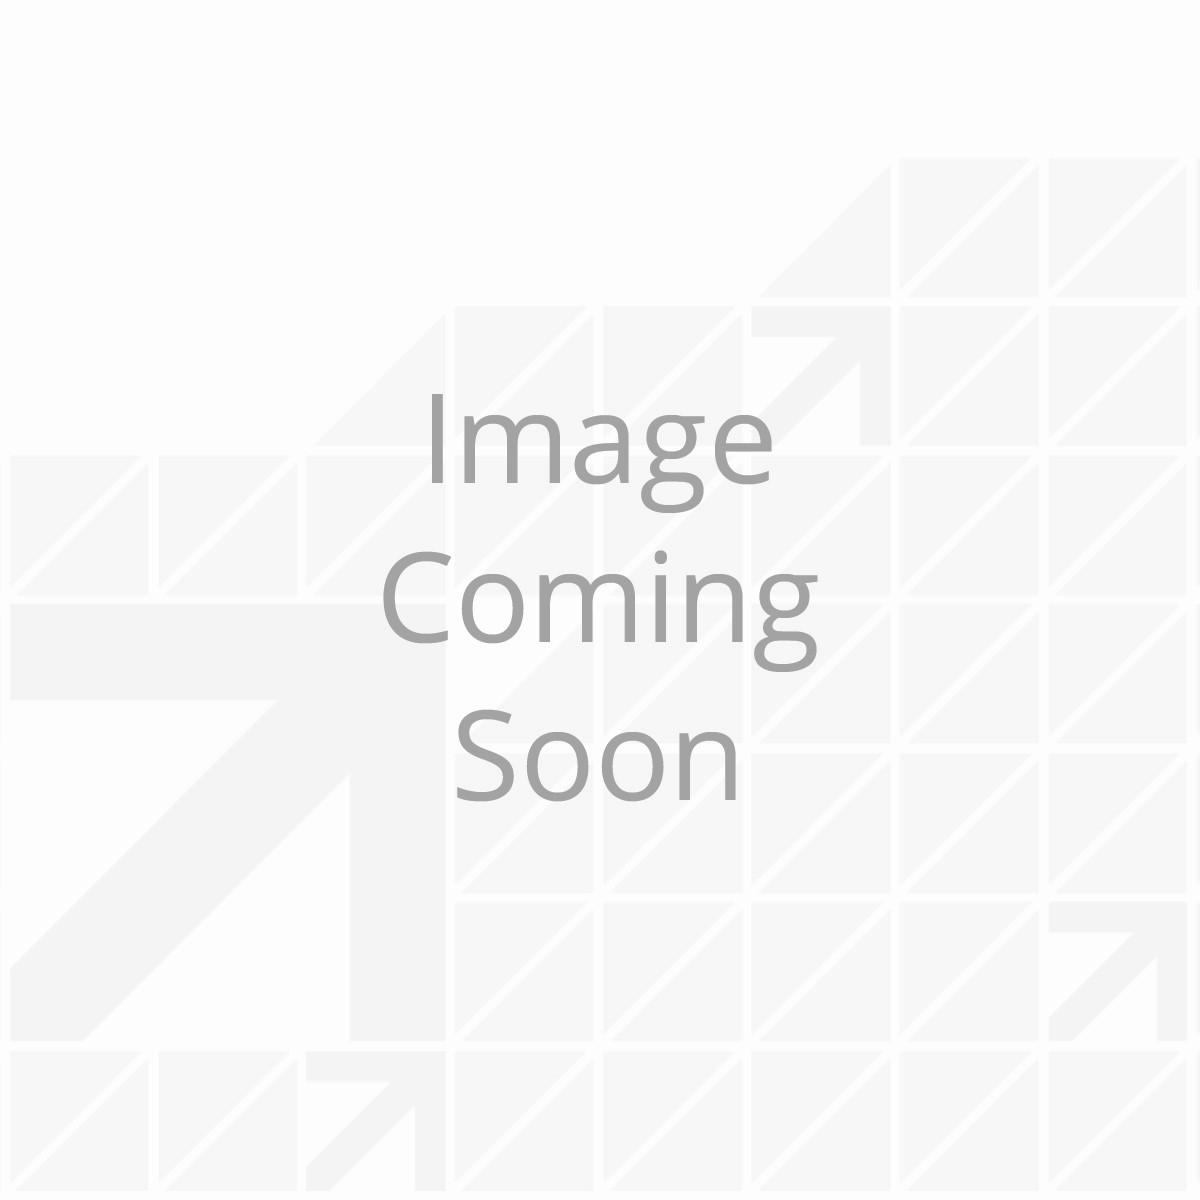 141323_Hex-Plug_001